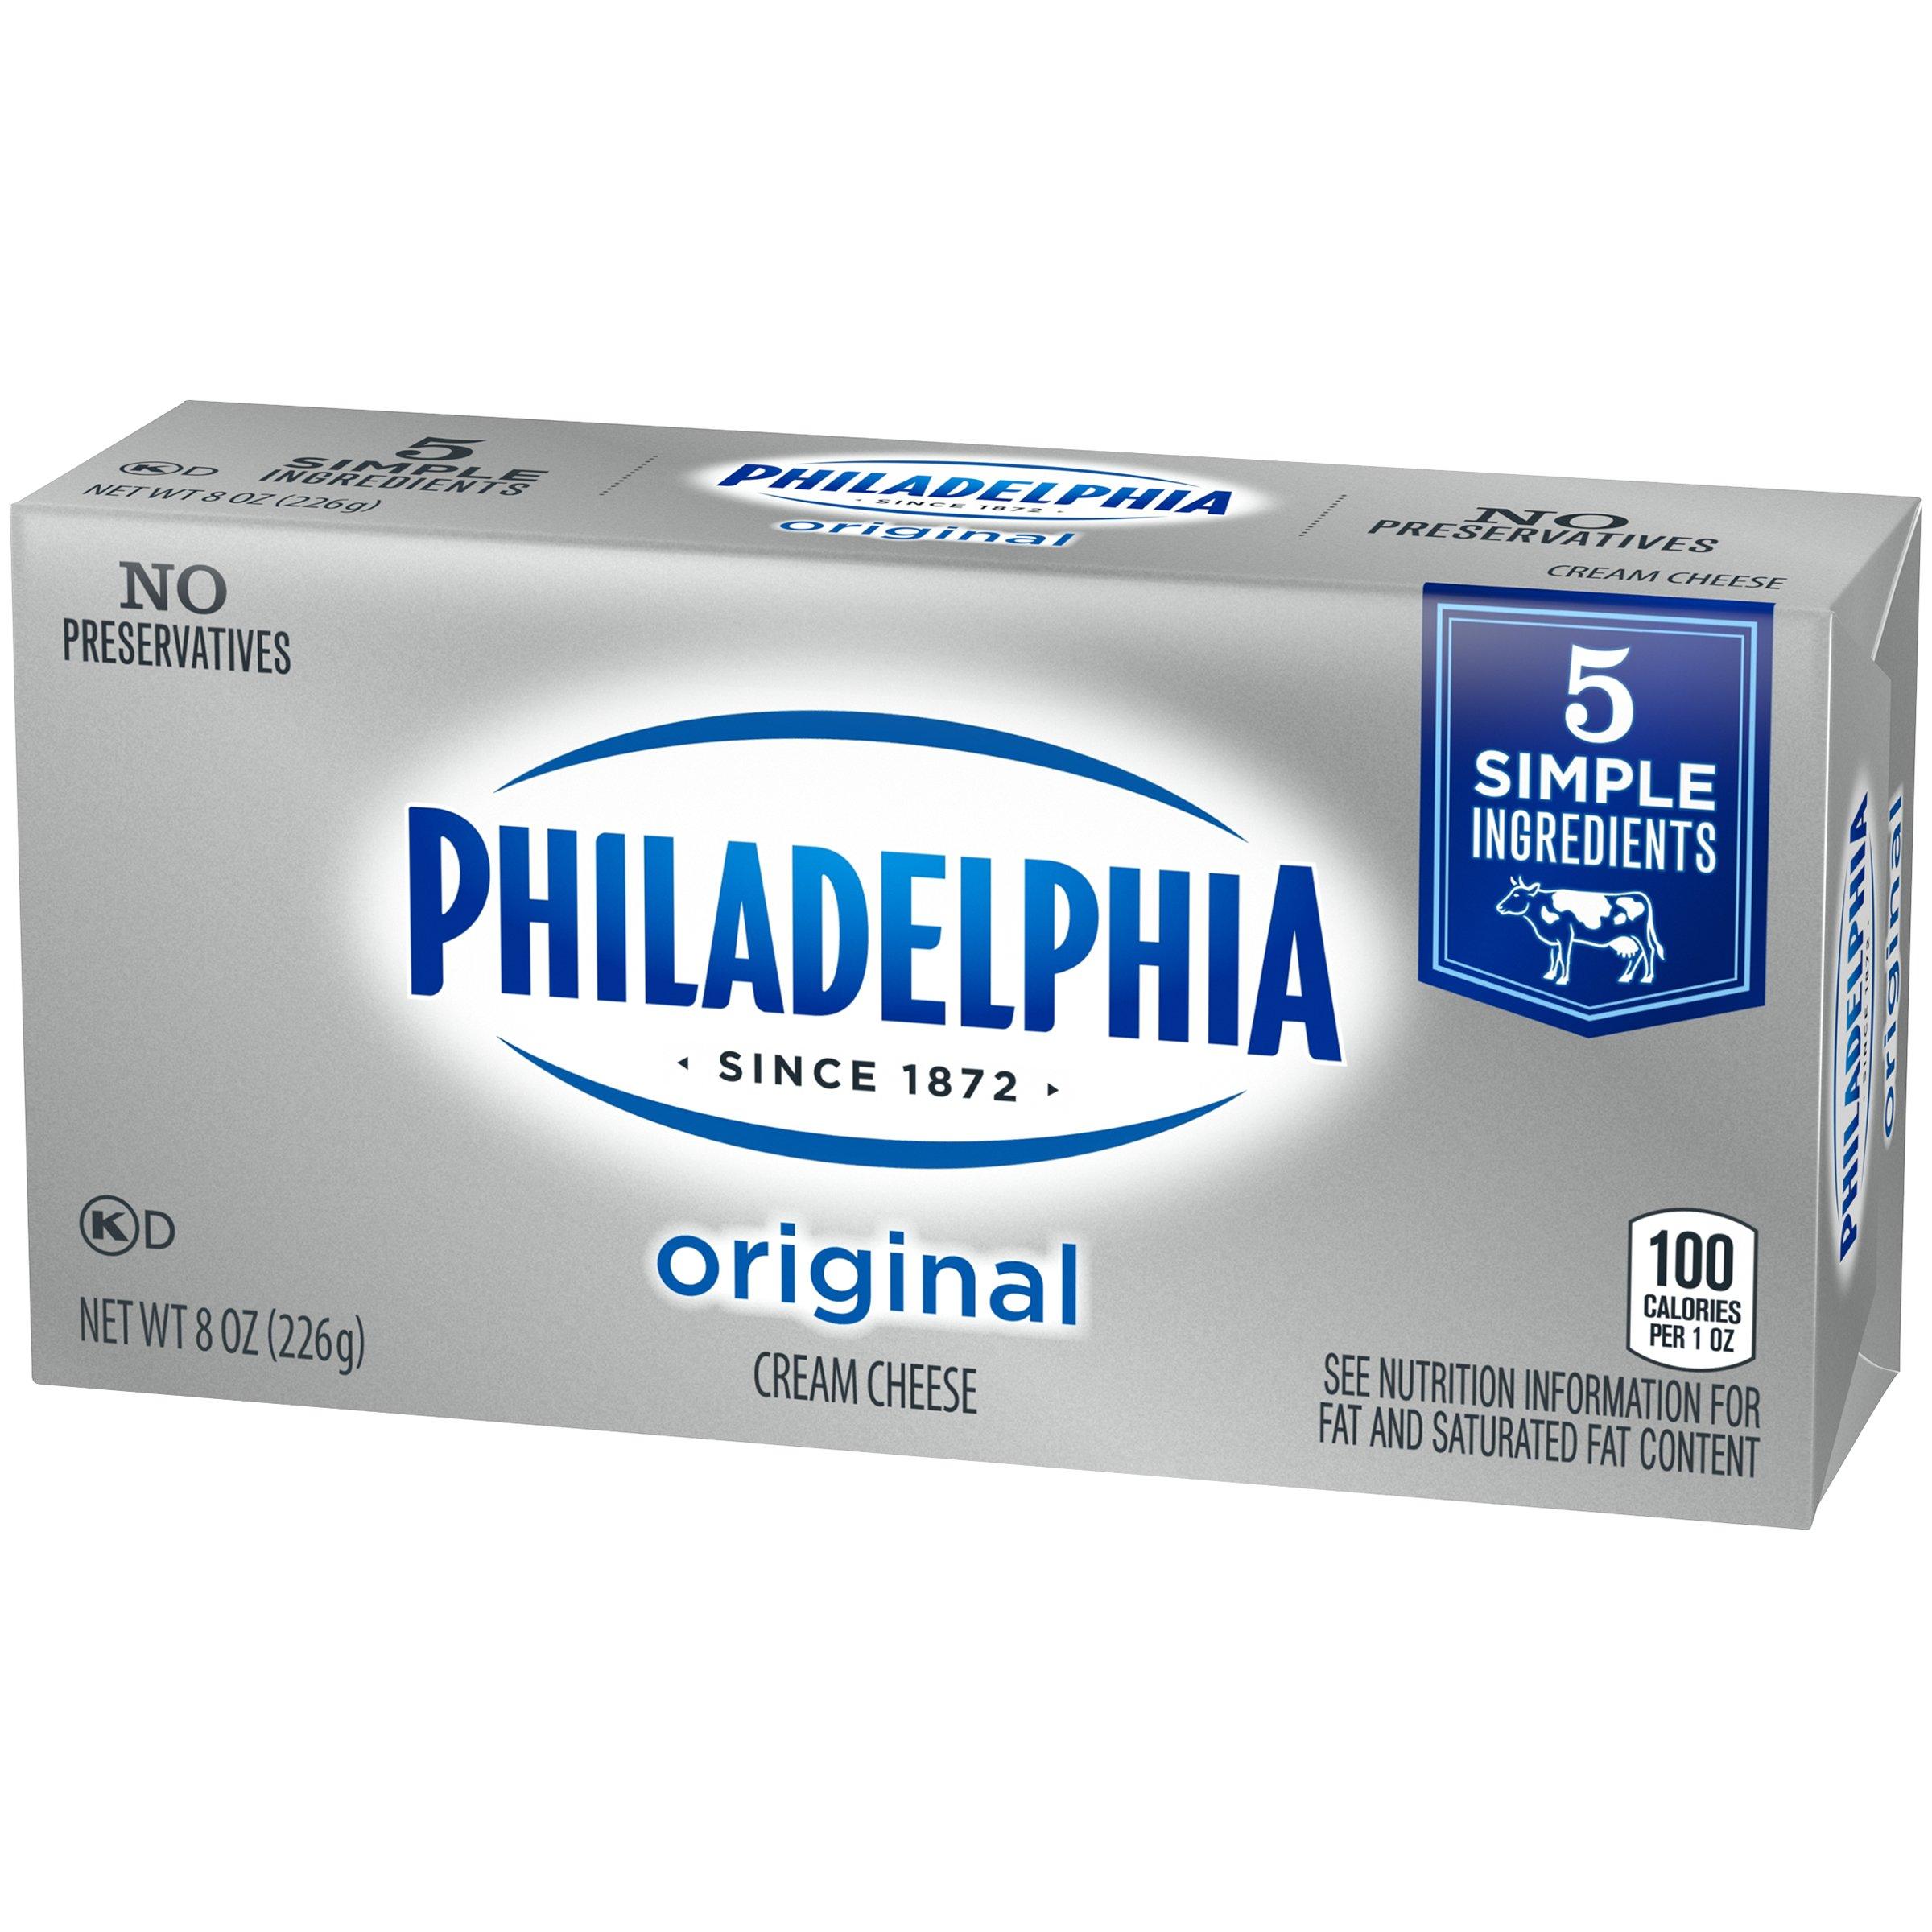 Philadelphia Original Cream Cheese Brick, 8 oz Box